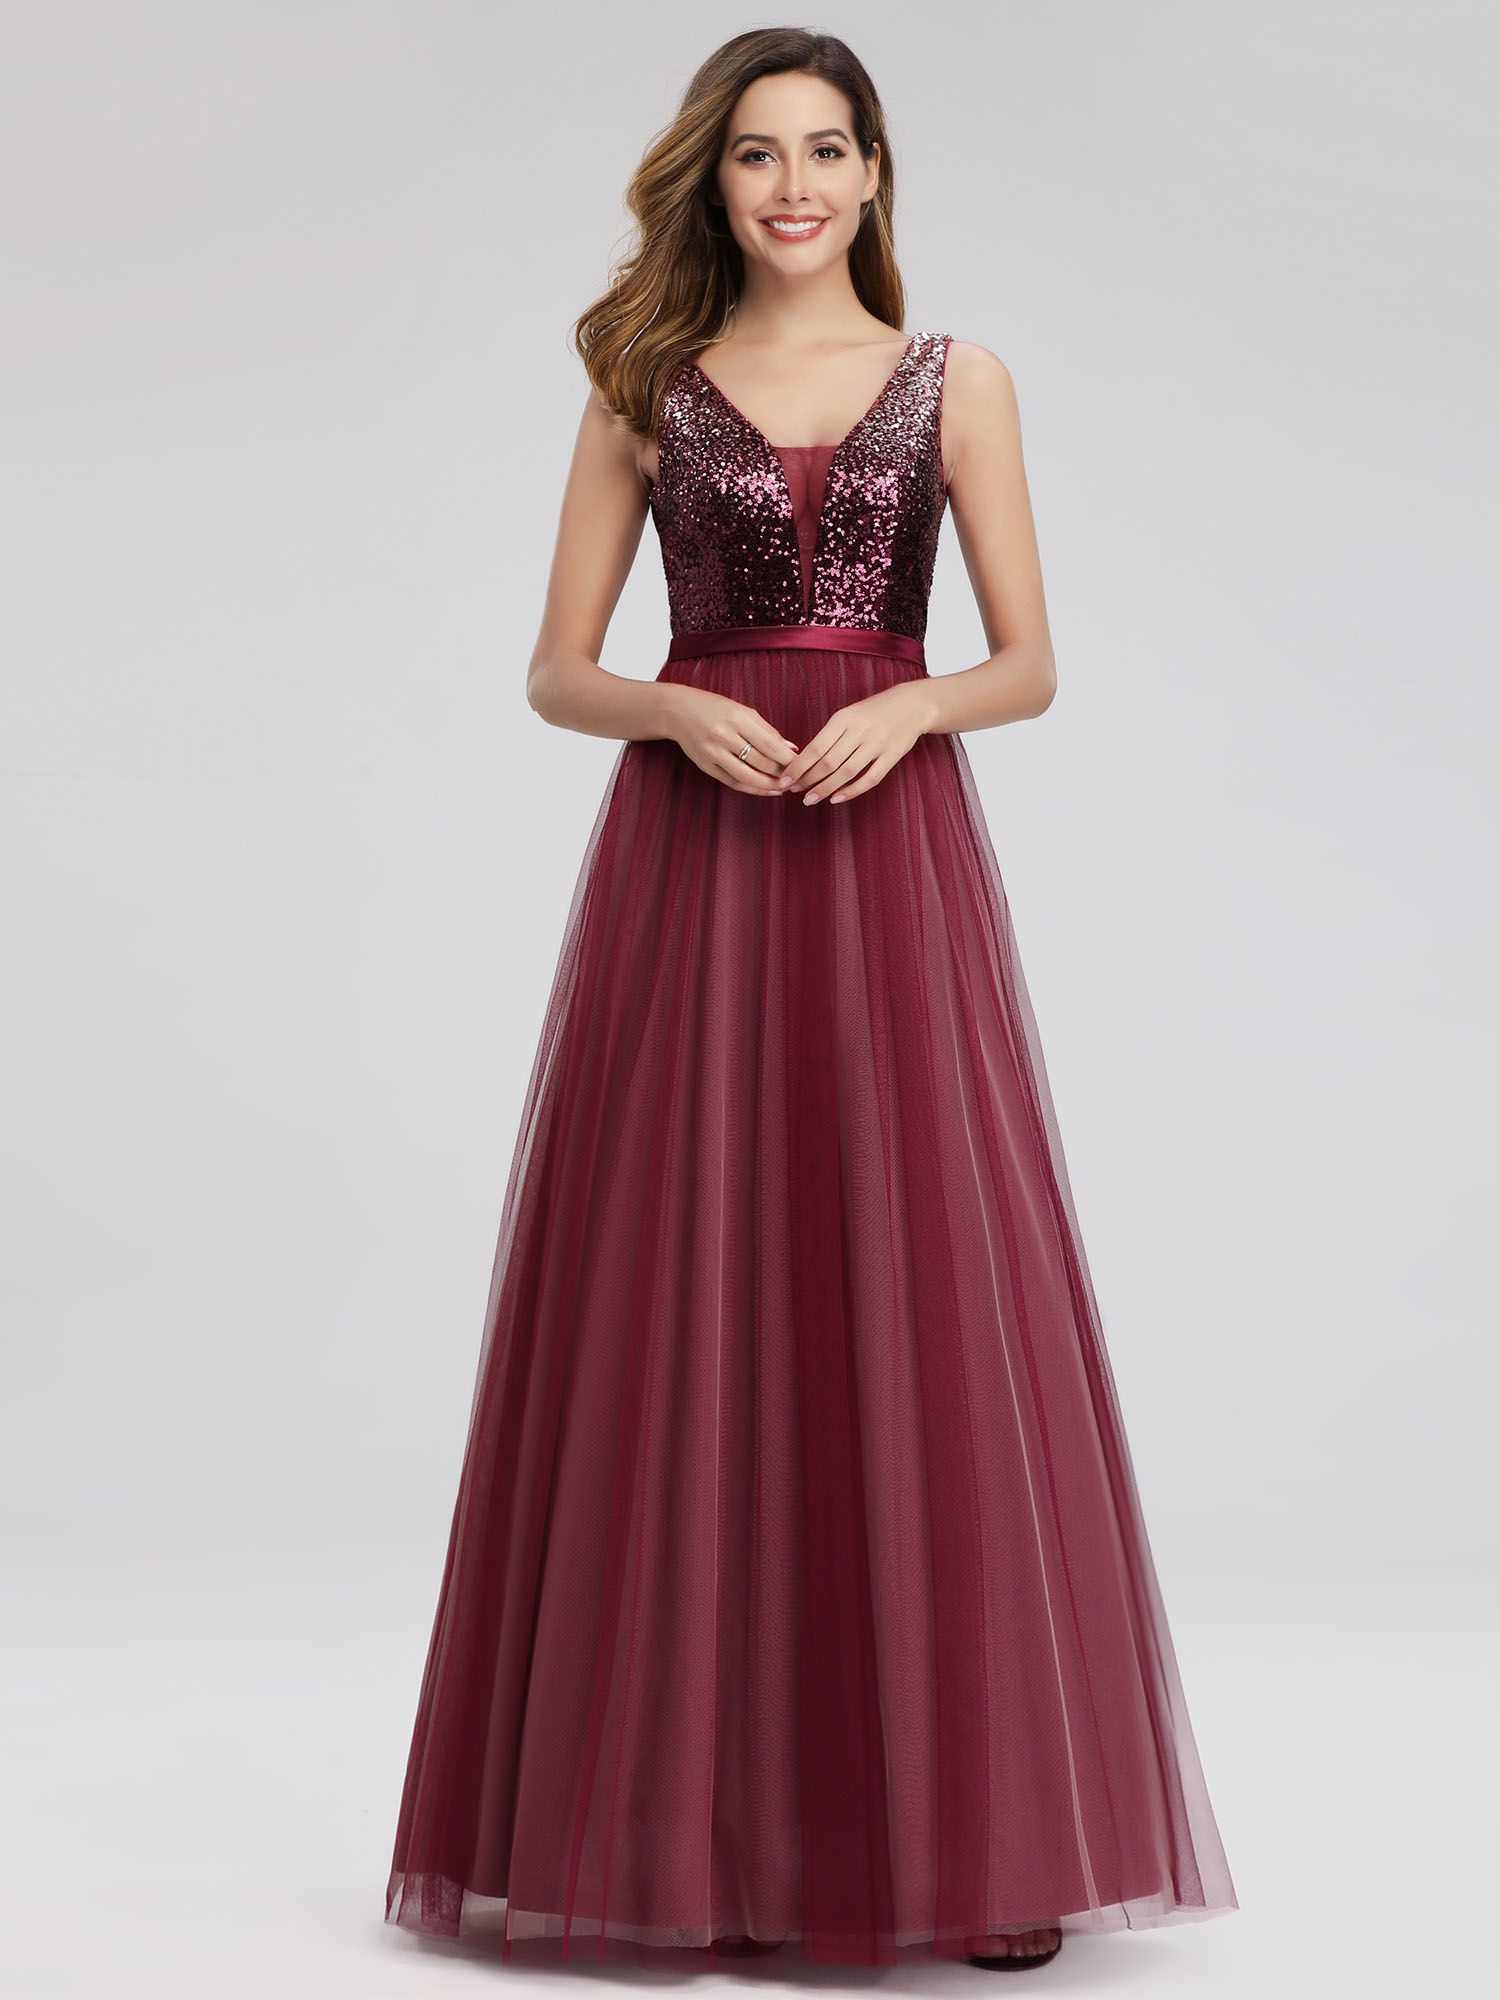 Ever Pretty Ever Pretty Womens Elegant V Neck Formal Evening Dresses For Women 07910 Burgundy Us4 Walmart Com Prom Dresses Sleeveless Evening Gowns Prom Dresses Long [ 2000 x 1500 Pixel ]